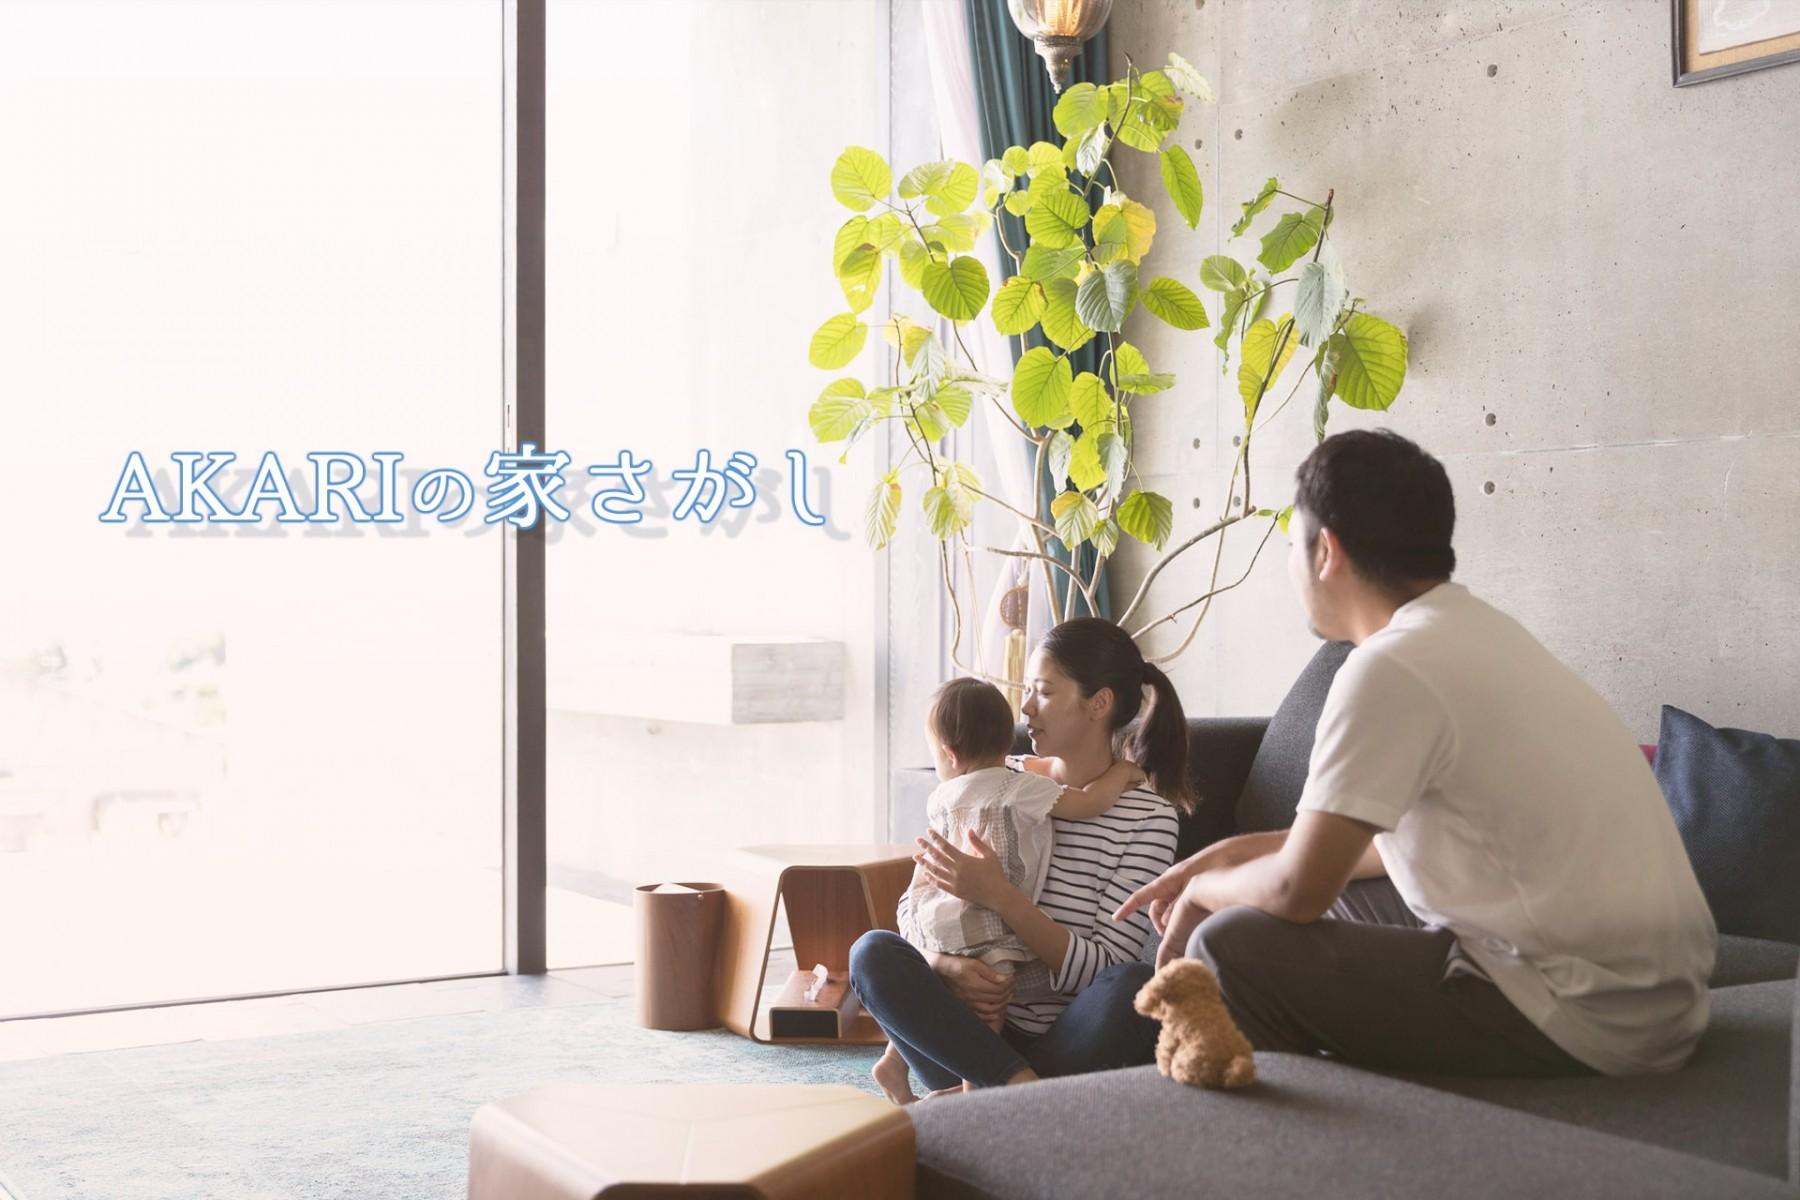 ㈱AKARI(アカリ)/未来に灯す家さがし/横浜・川崎・東京